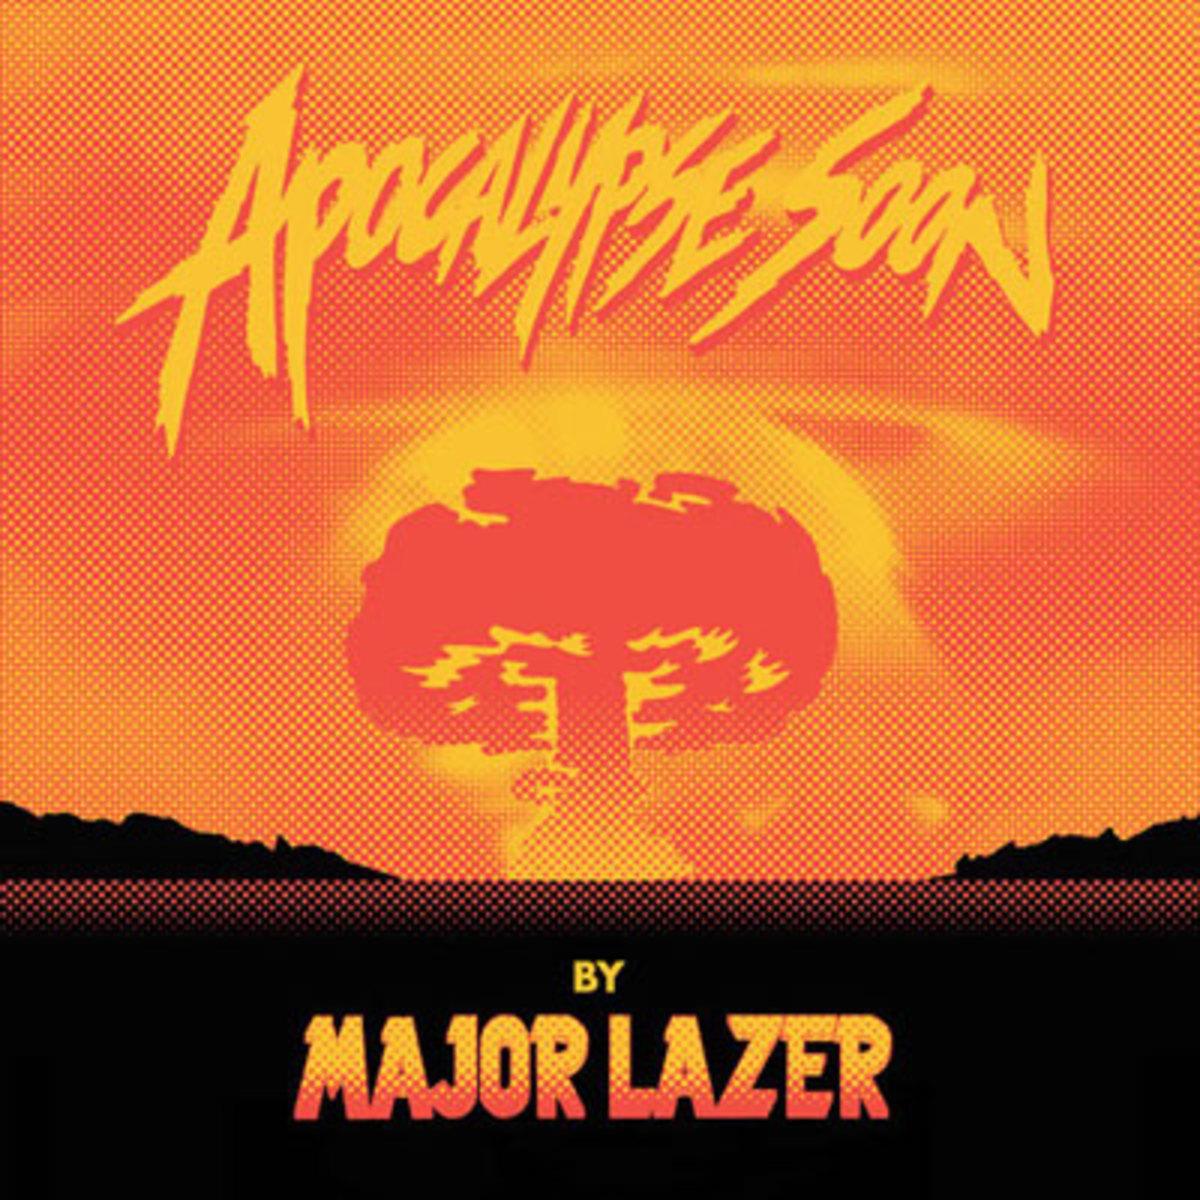 majorlazer-apocsoon.jpg